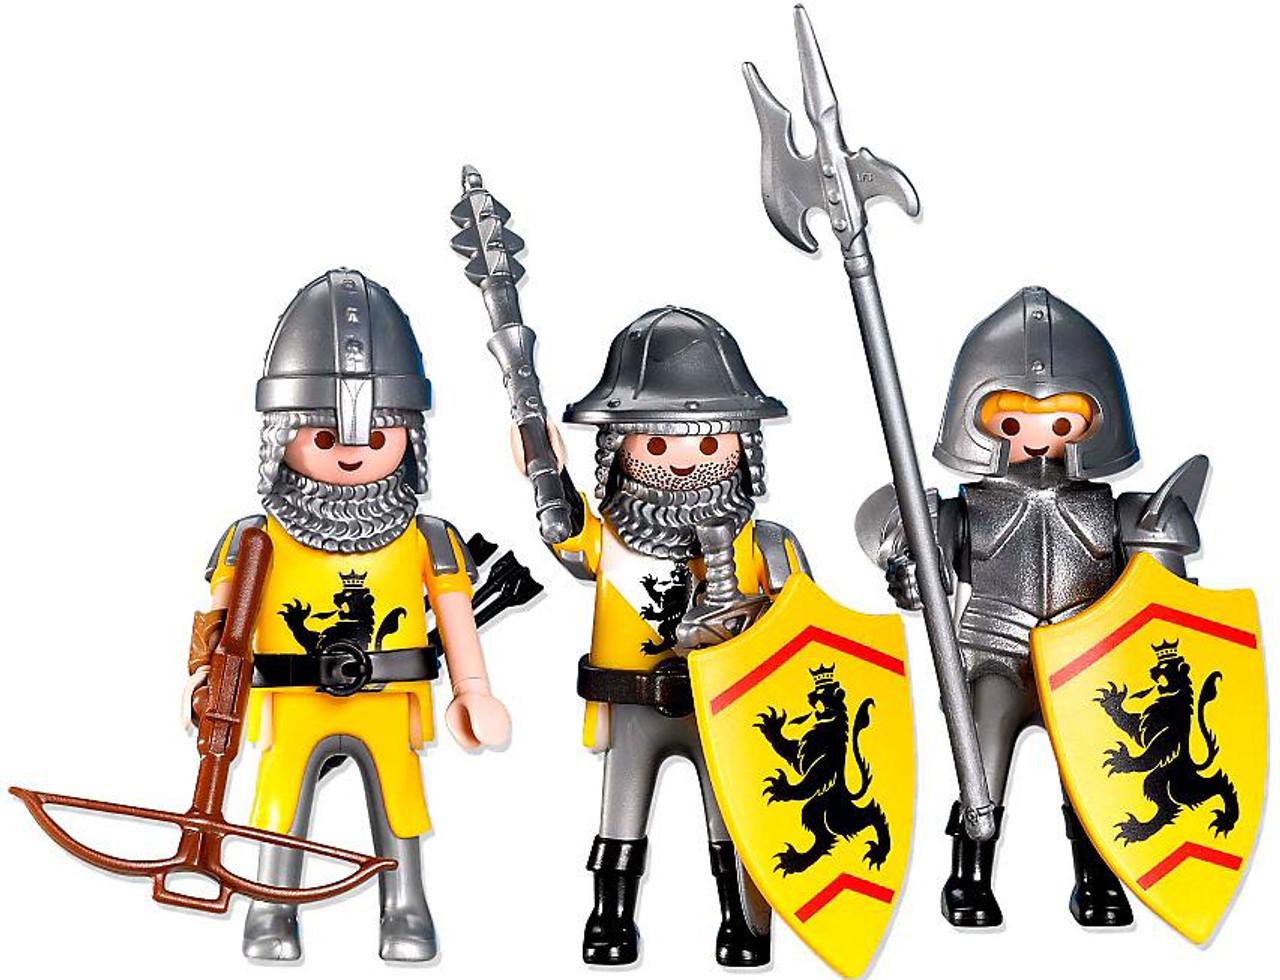 Playmobil Three Yellow Lion Knights Set #7535